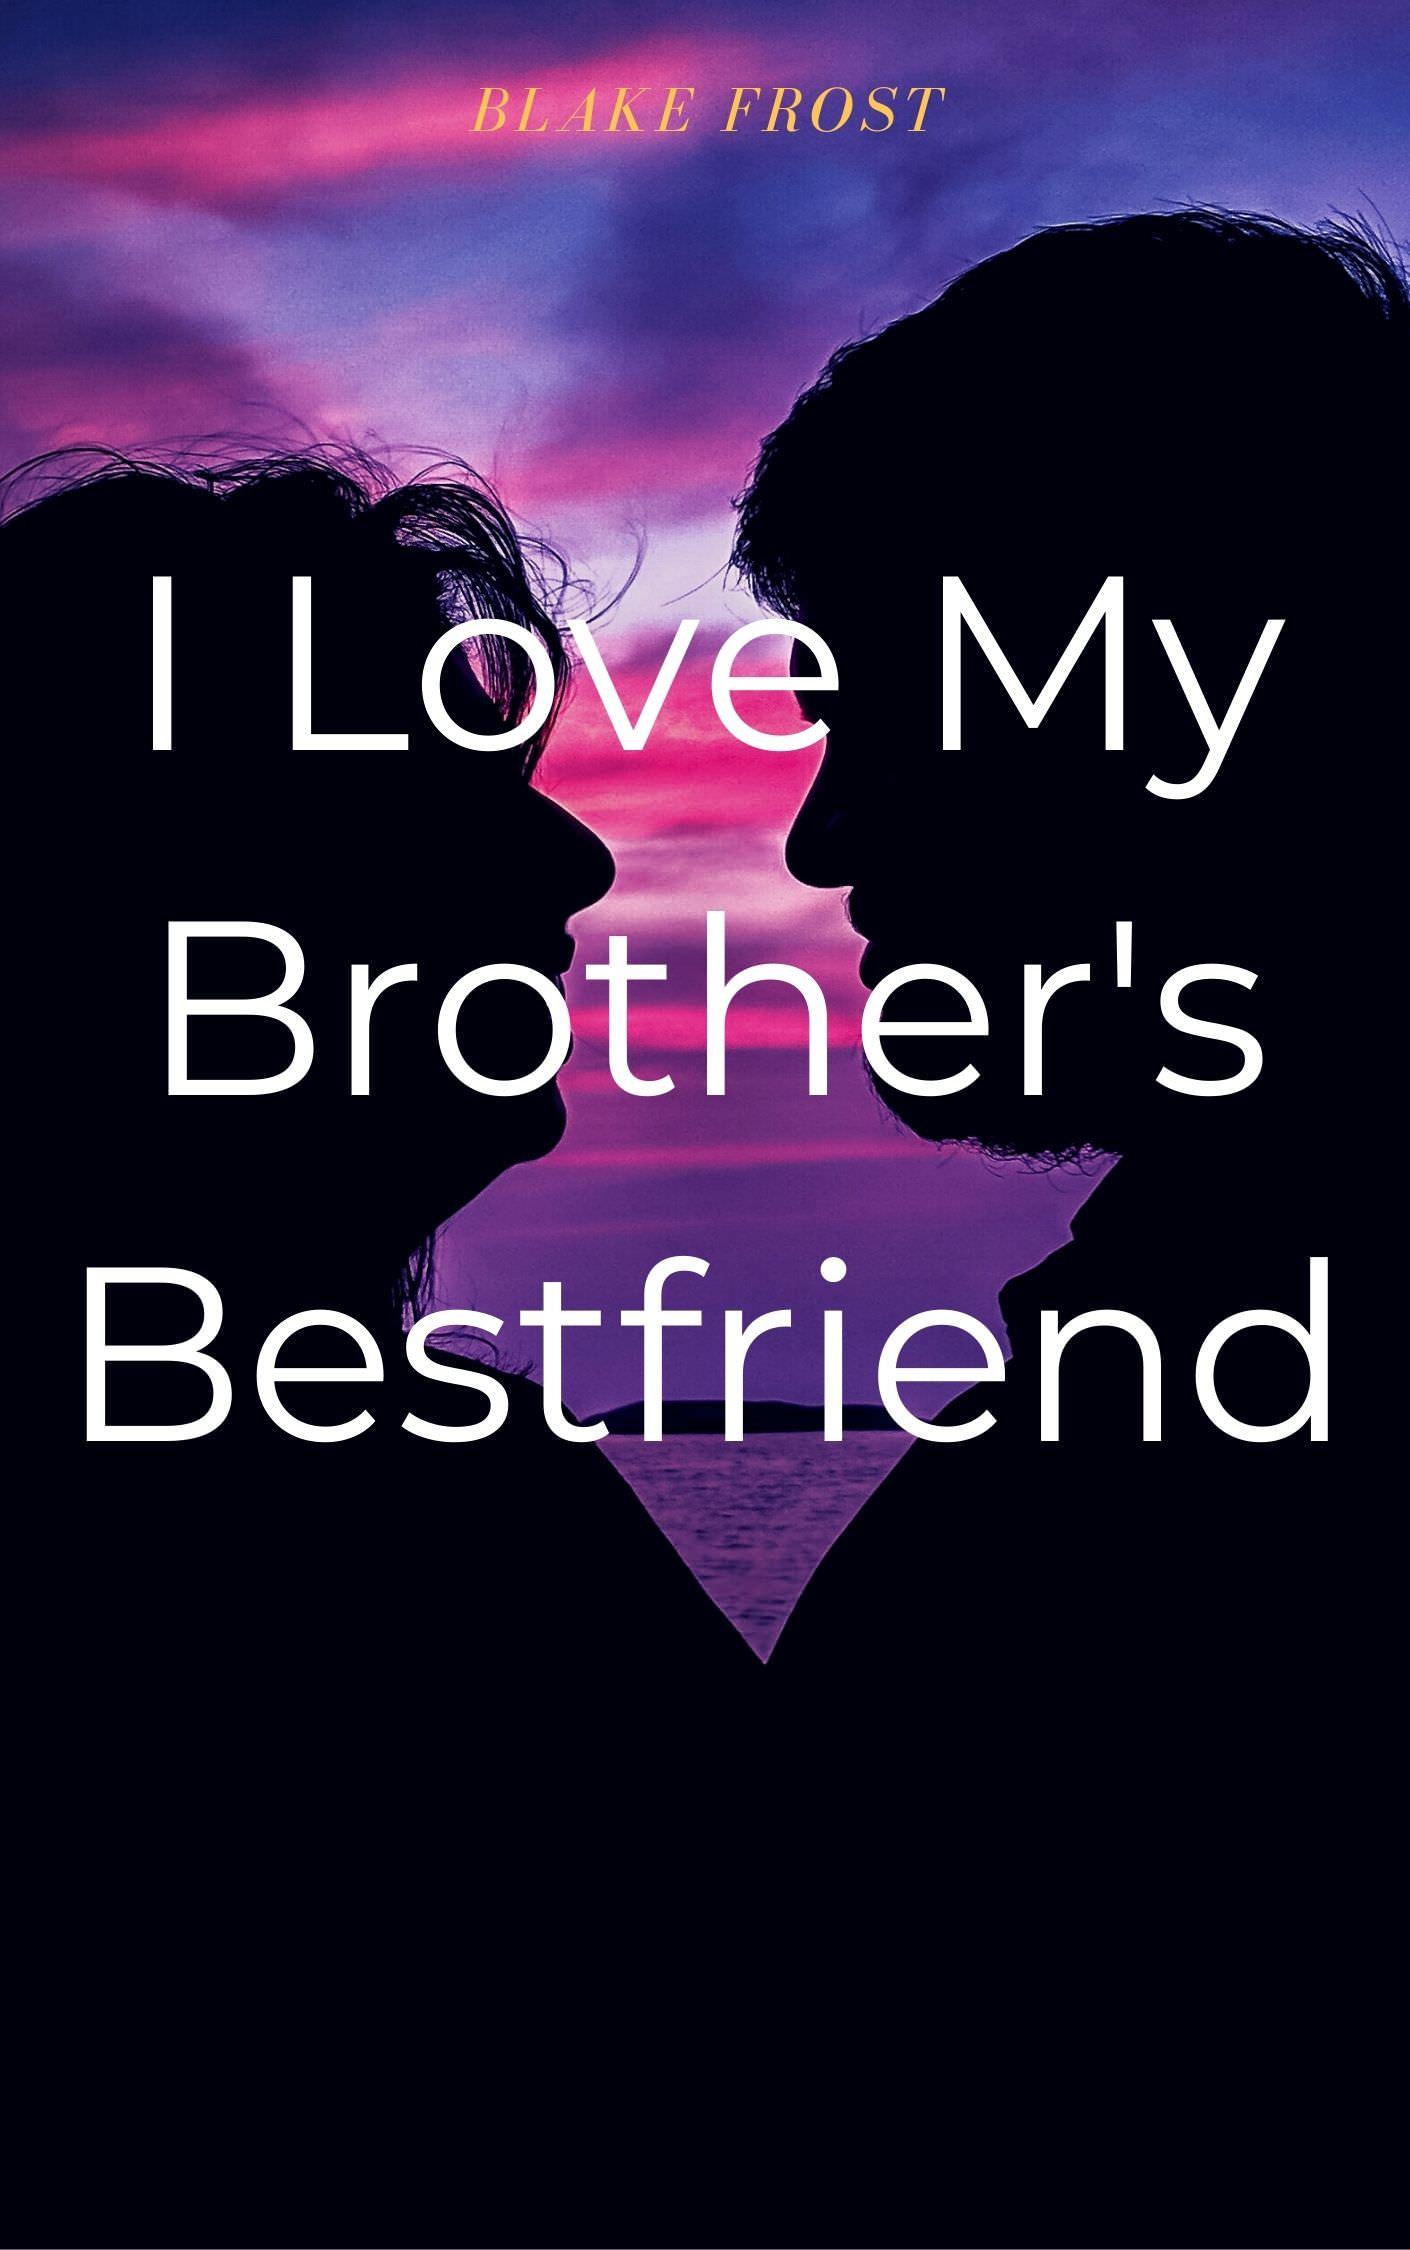 I Love My Brother's Bestfriend